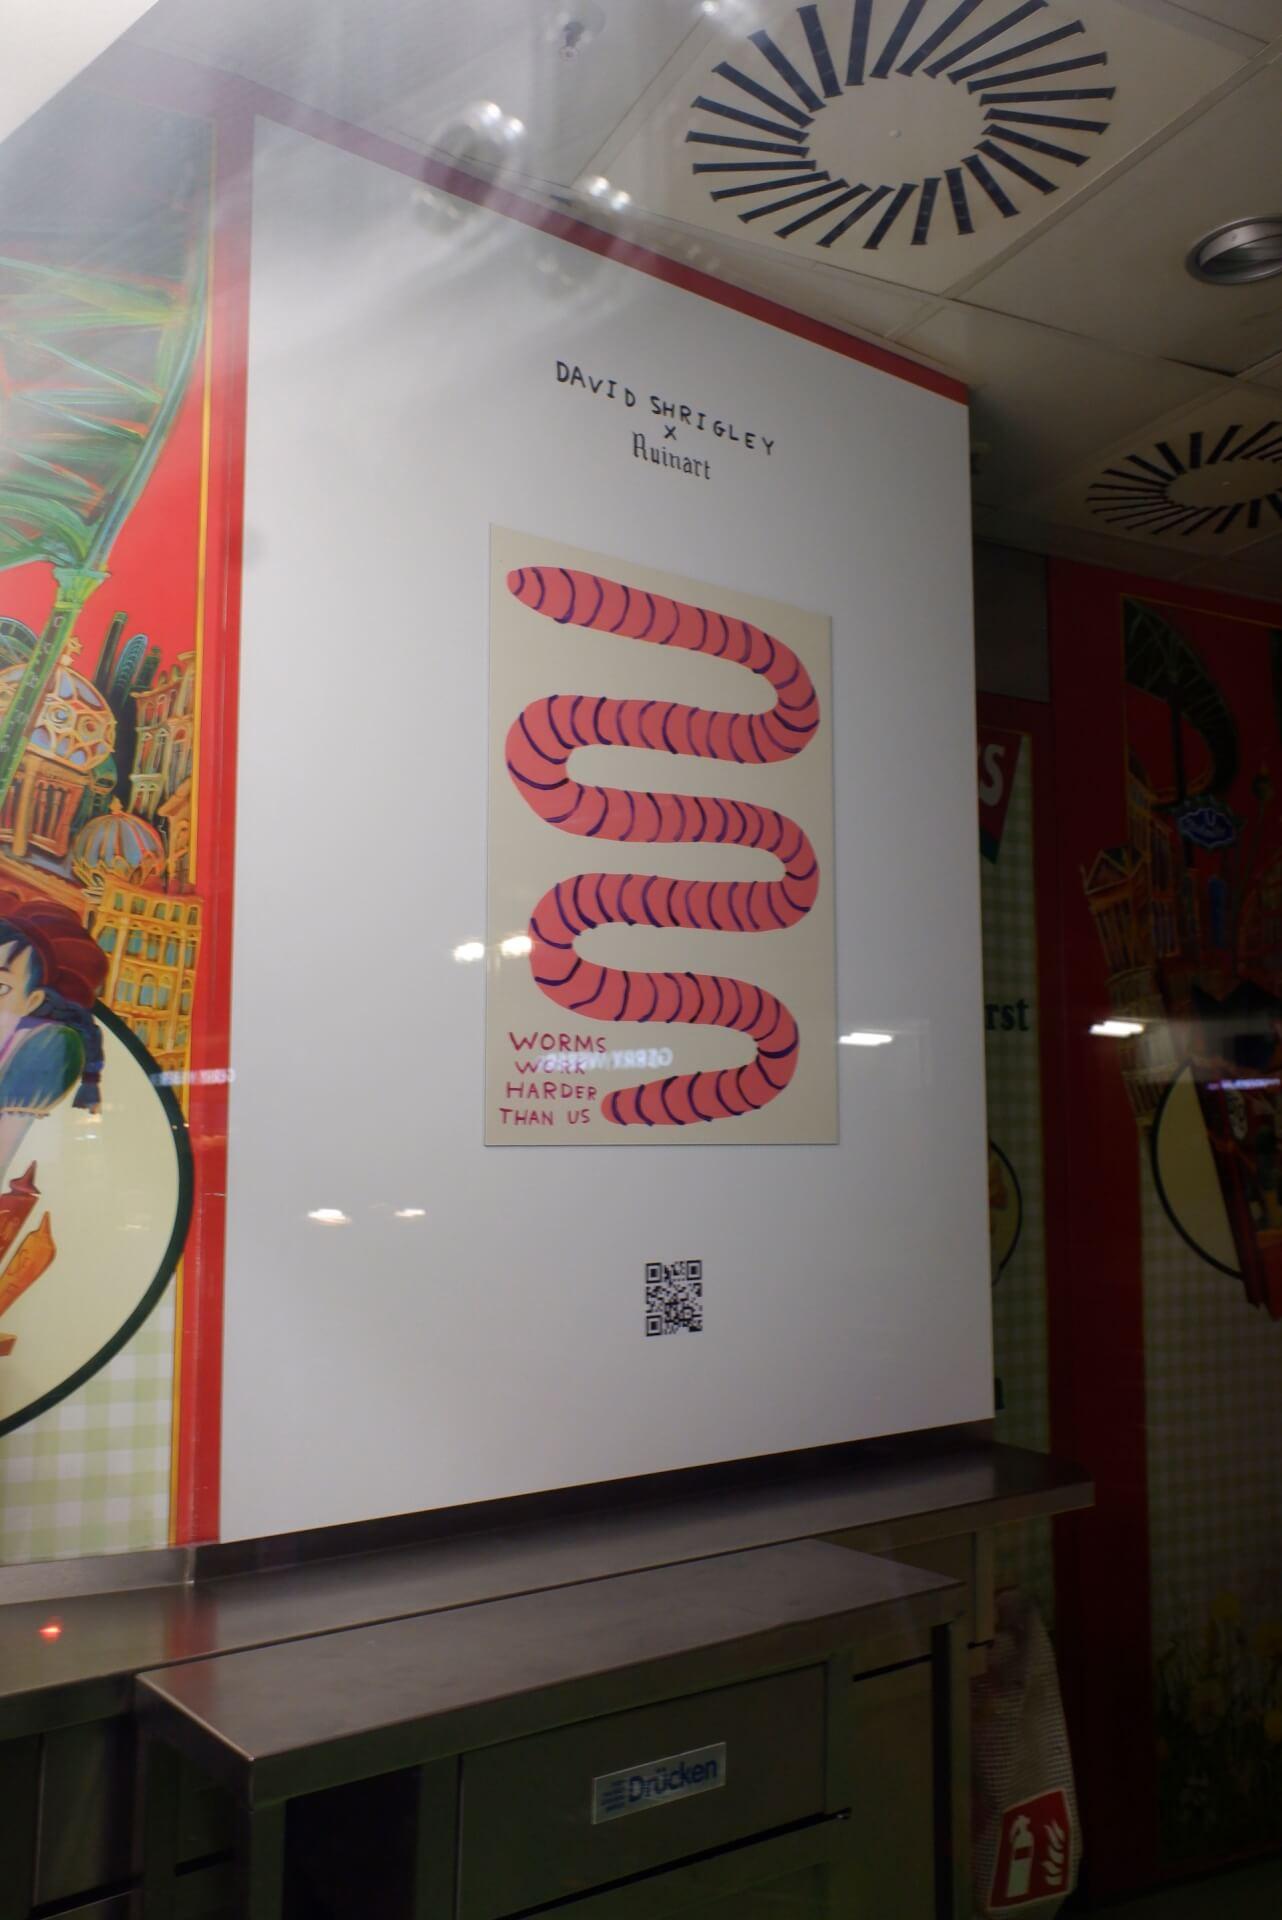 『Berlin Art Week』現地レポート 進化し変化し続けるベルリンのアートカルチャー column210929kana-miyazawa-013